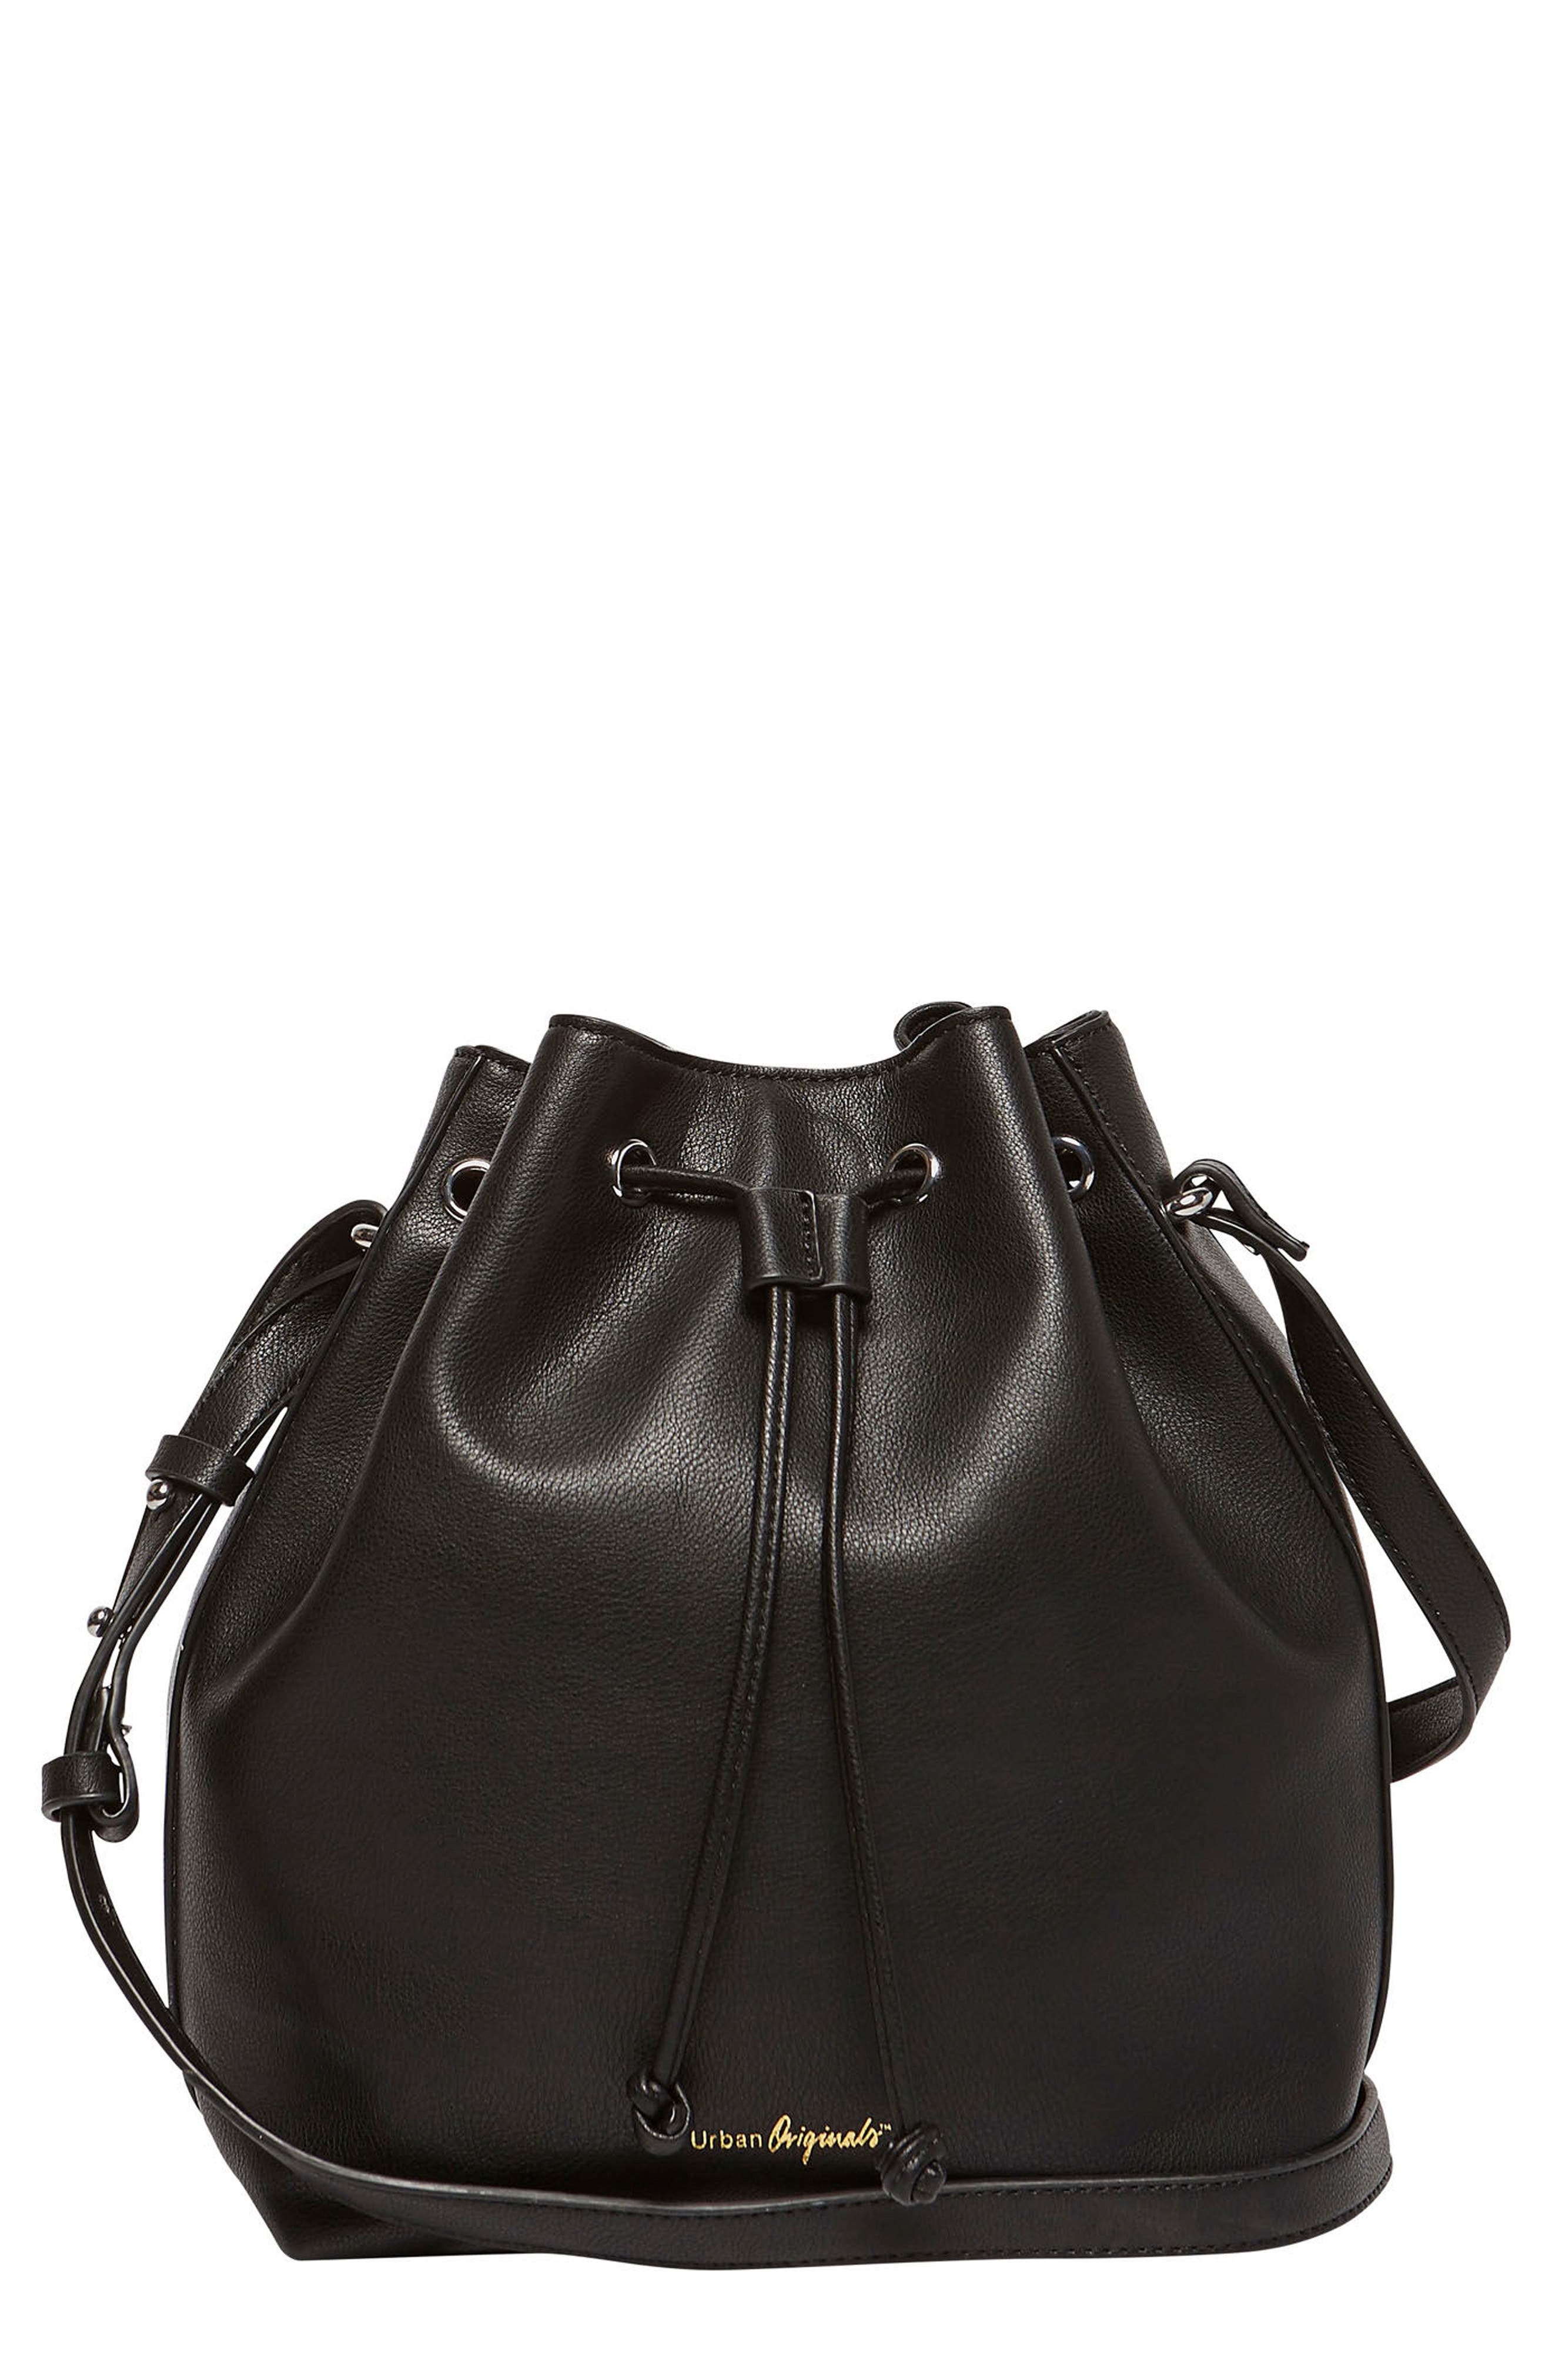 Take Me Home Vegan Leather Bag,                         Main,                         color, 001